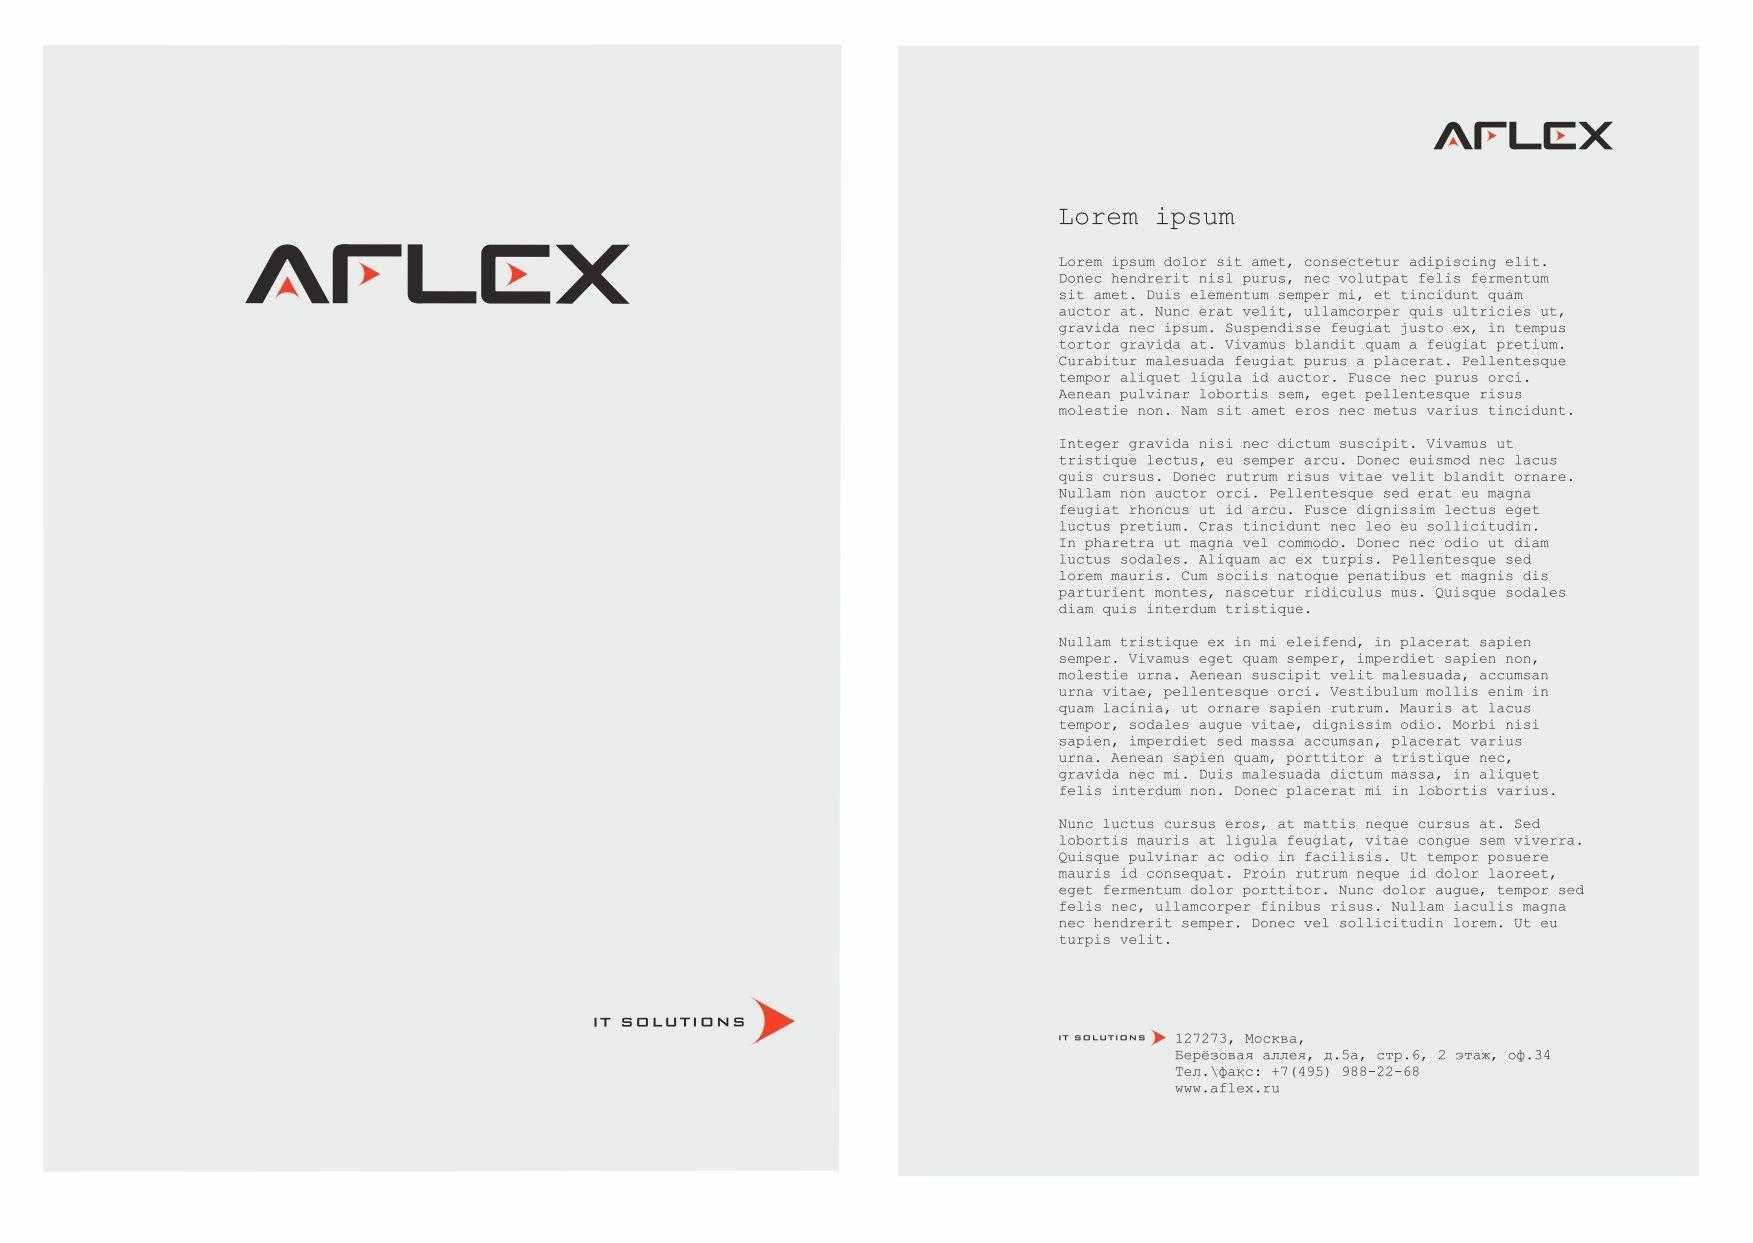 AFLEX-9